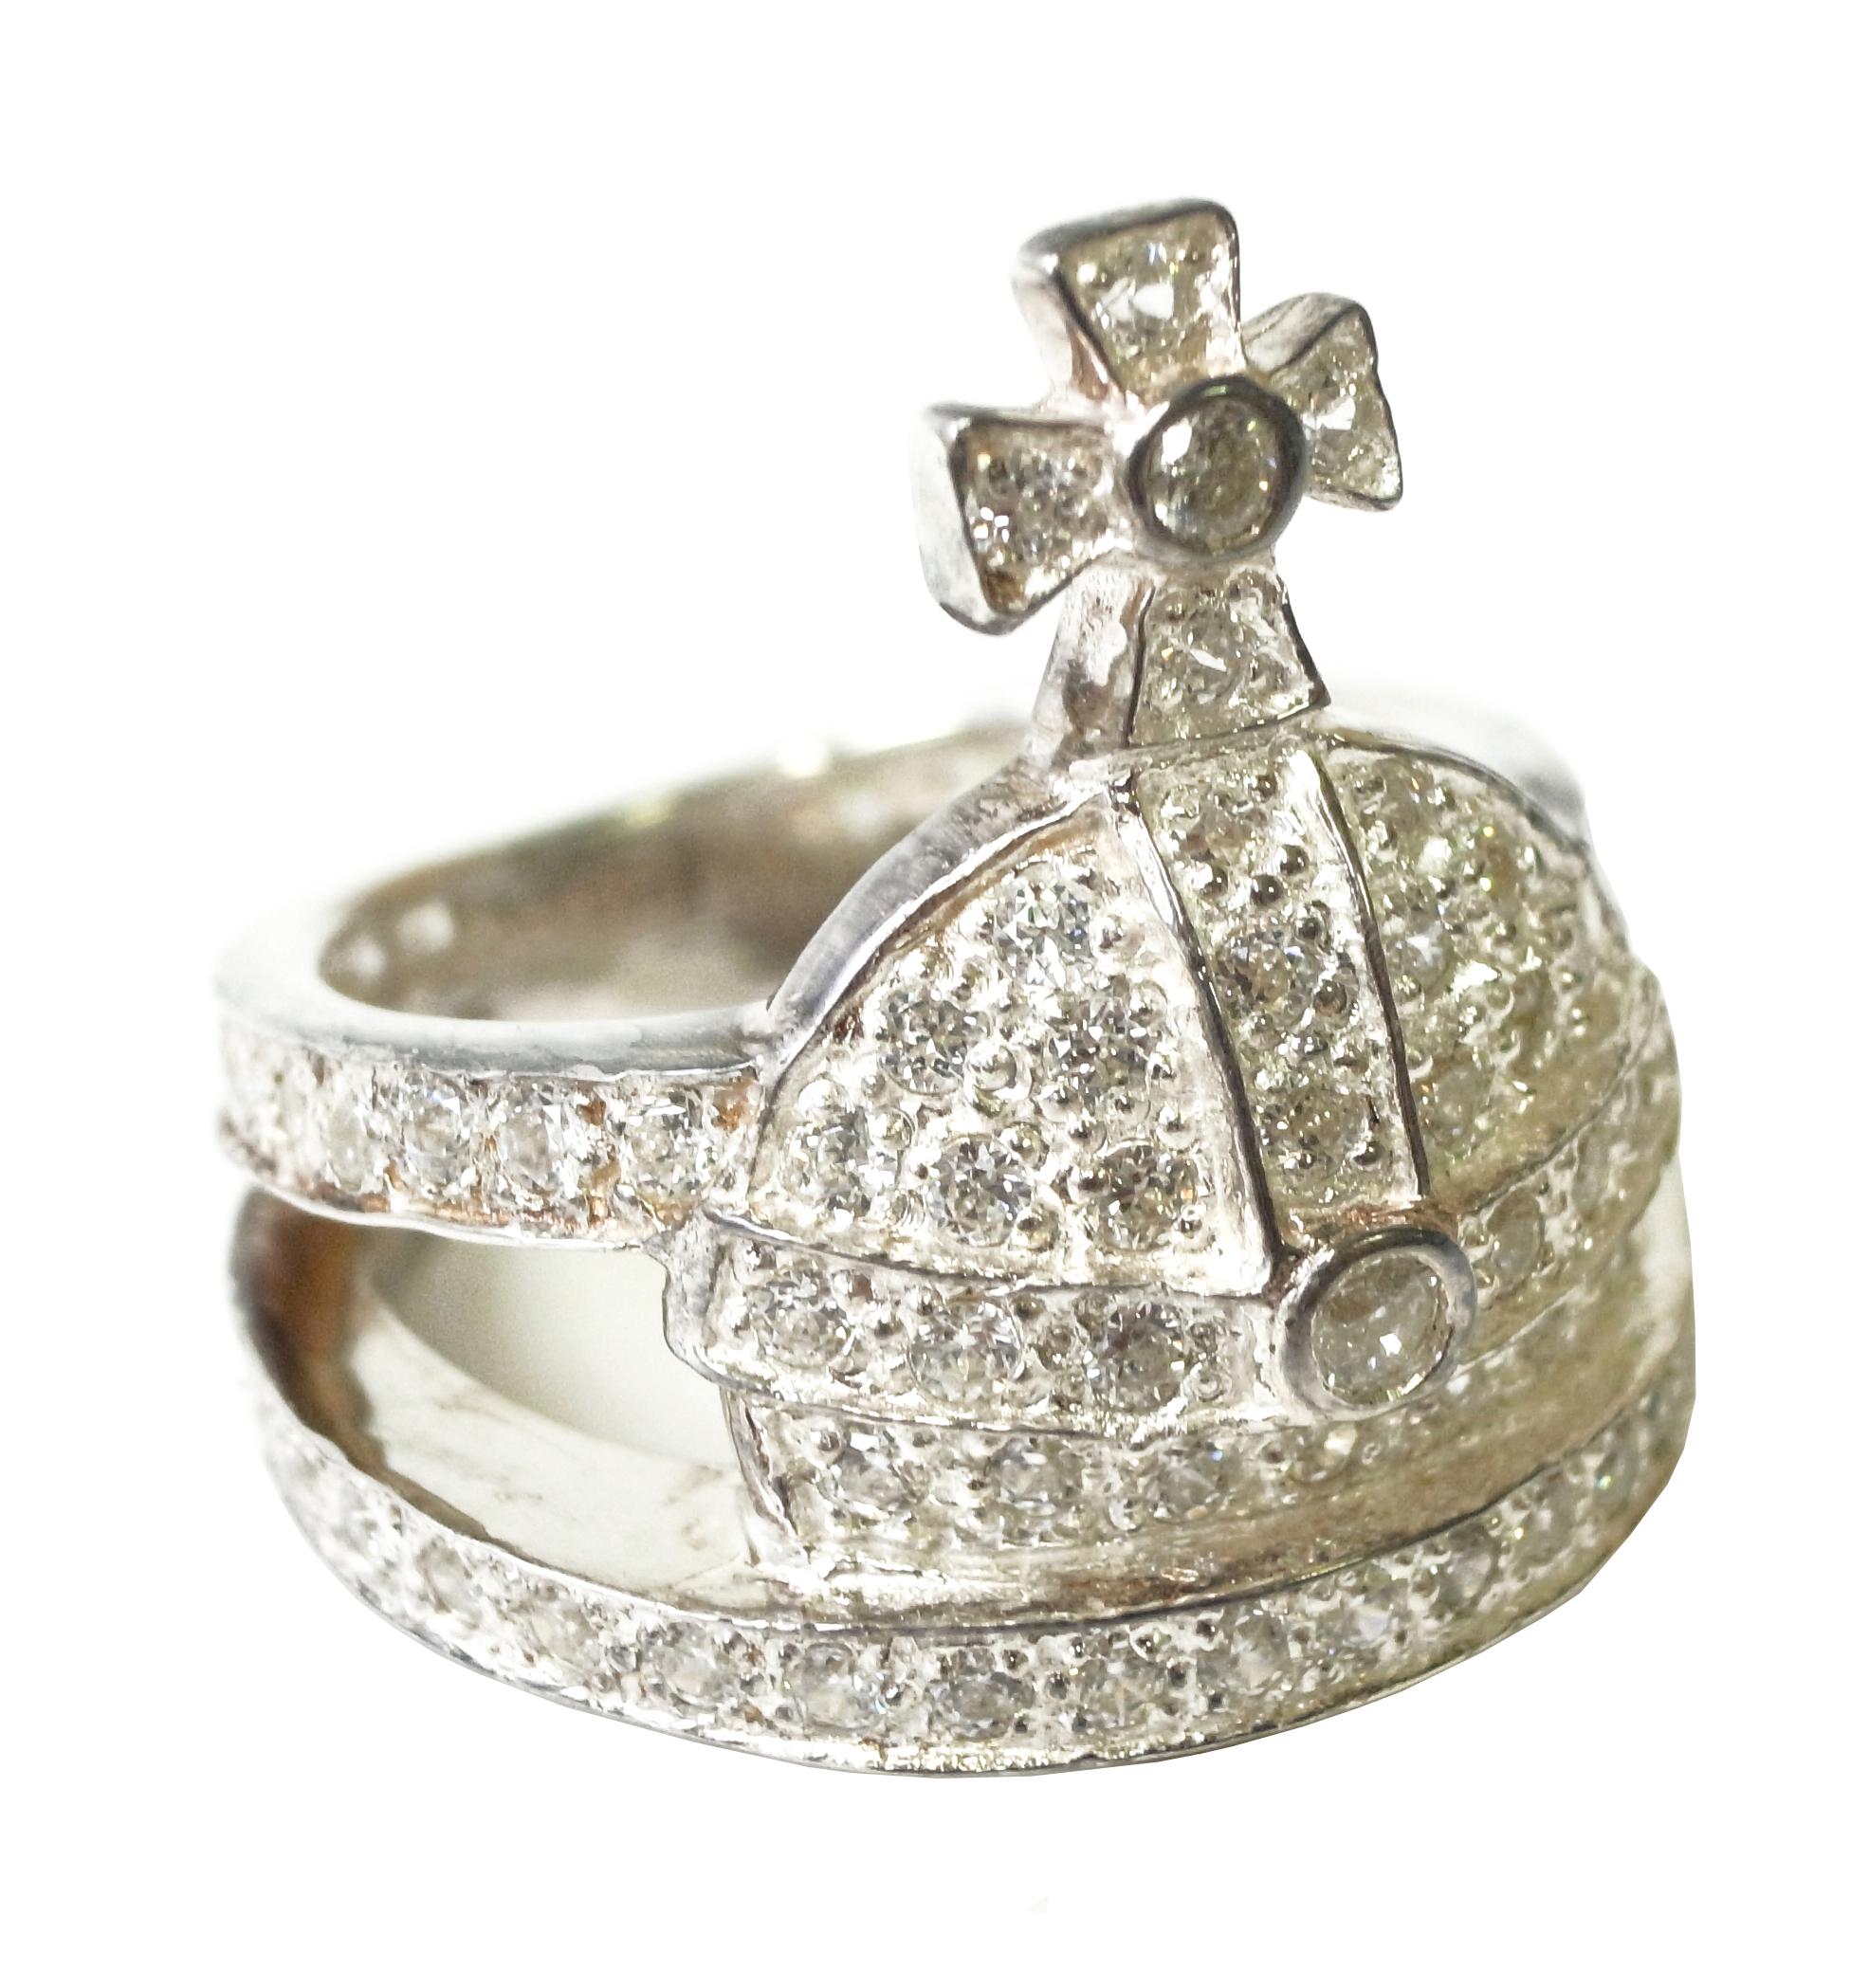 1b084bcd6000 ヴィヴィアンウエストウッド リング Mサイズ(約15号) Orb Ring Silver White CZ Silversterling Siver  Plating